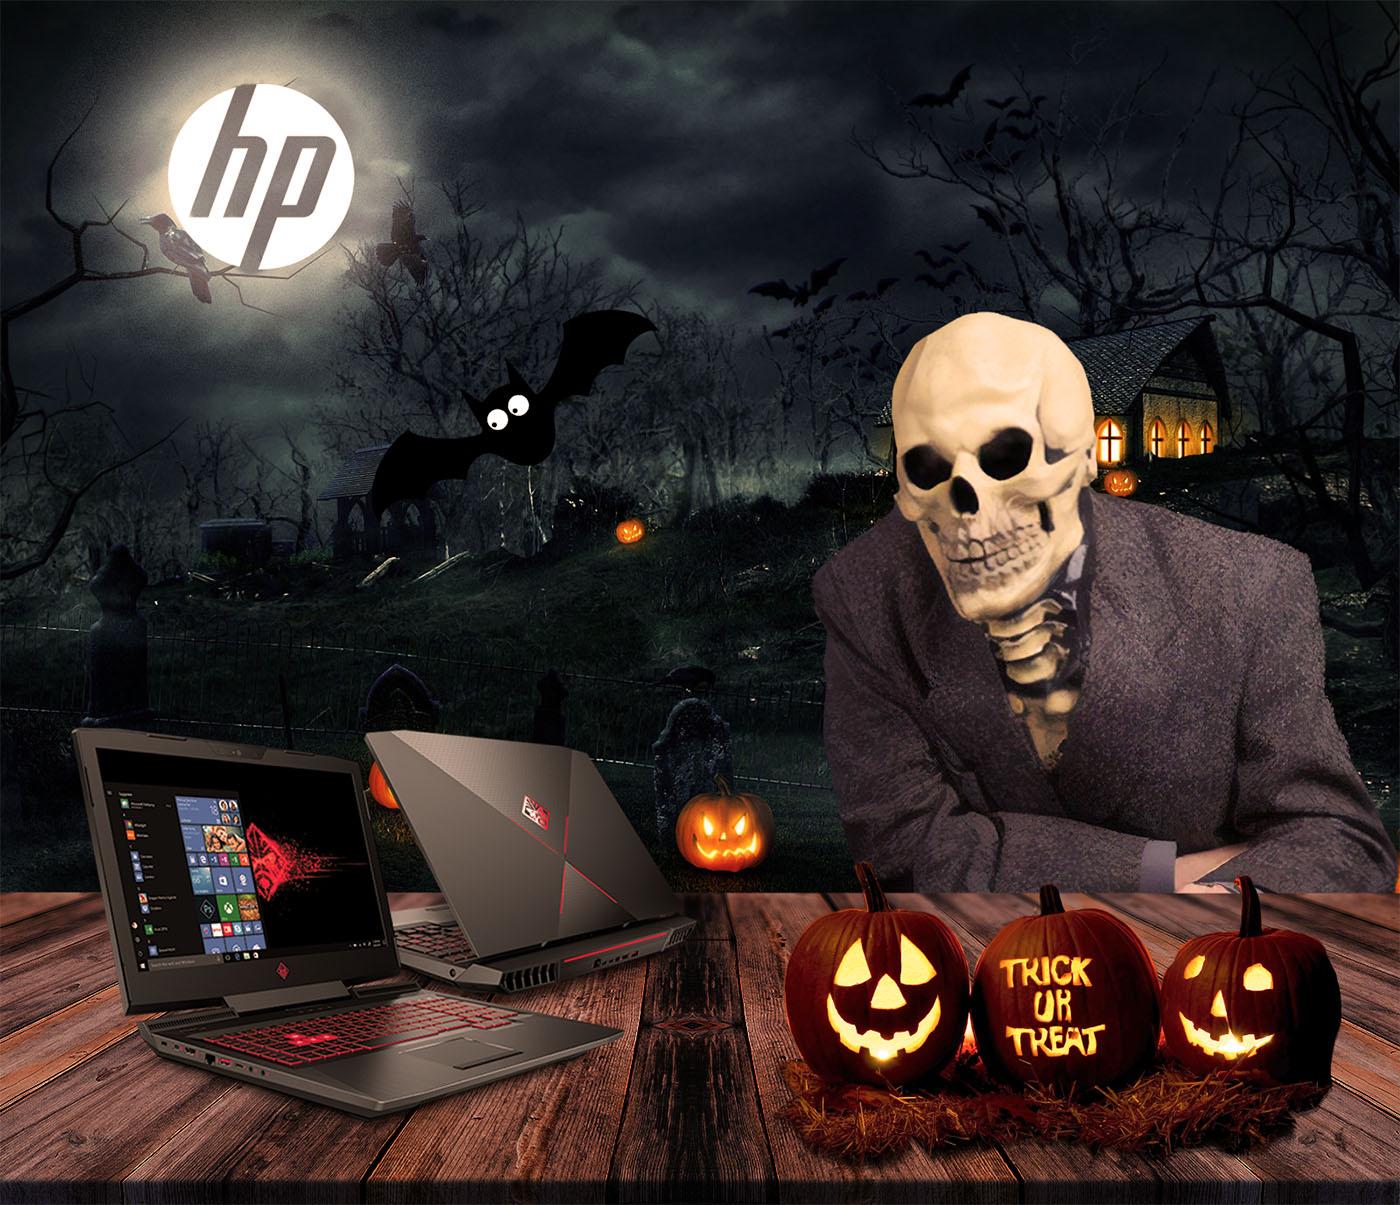 hp halloween deals are now live! omen gaming laptops, desktops, vr